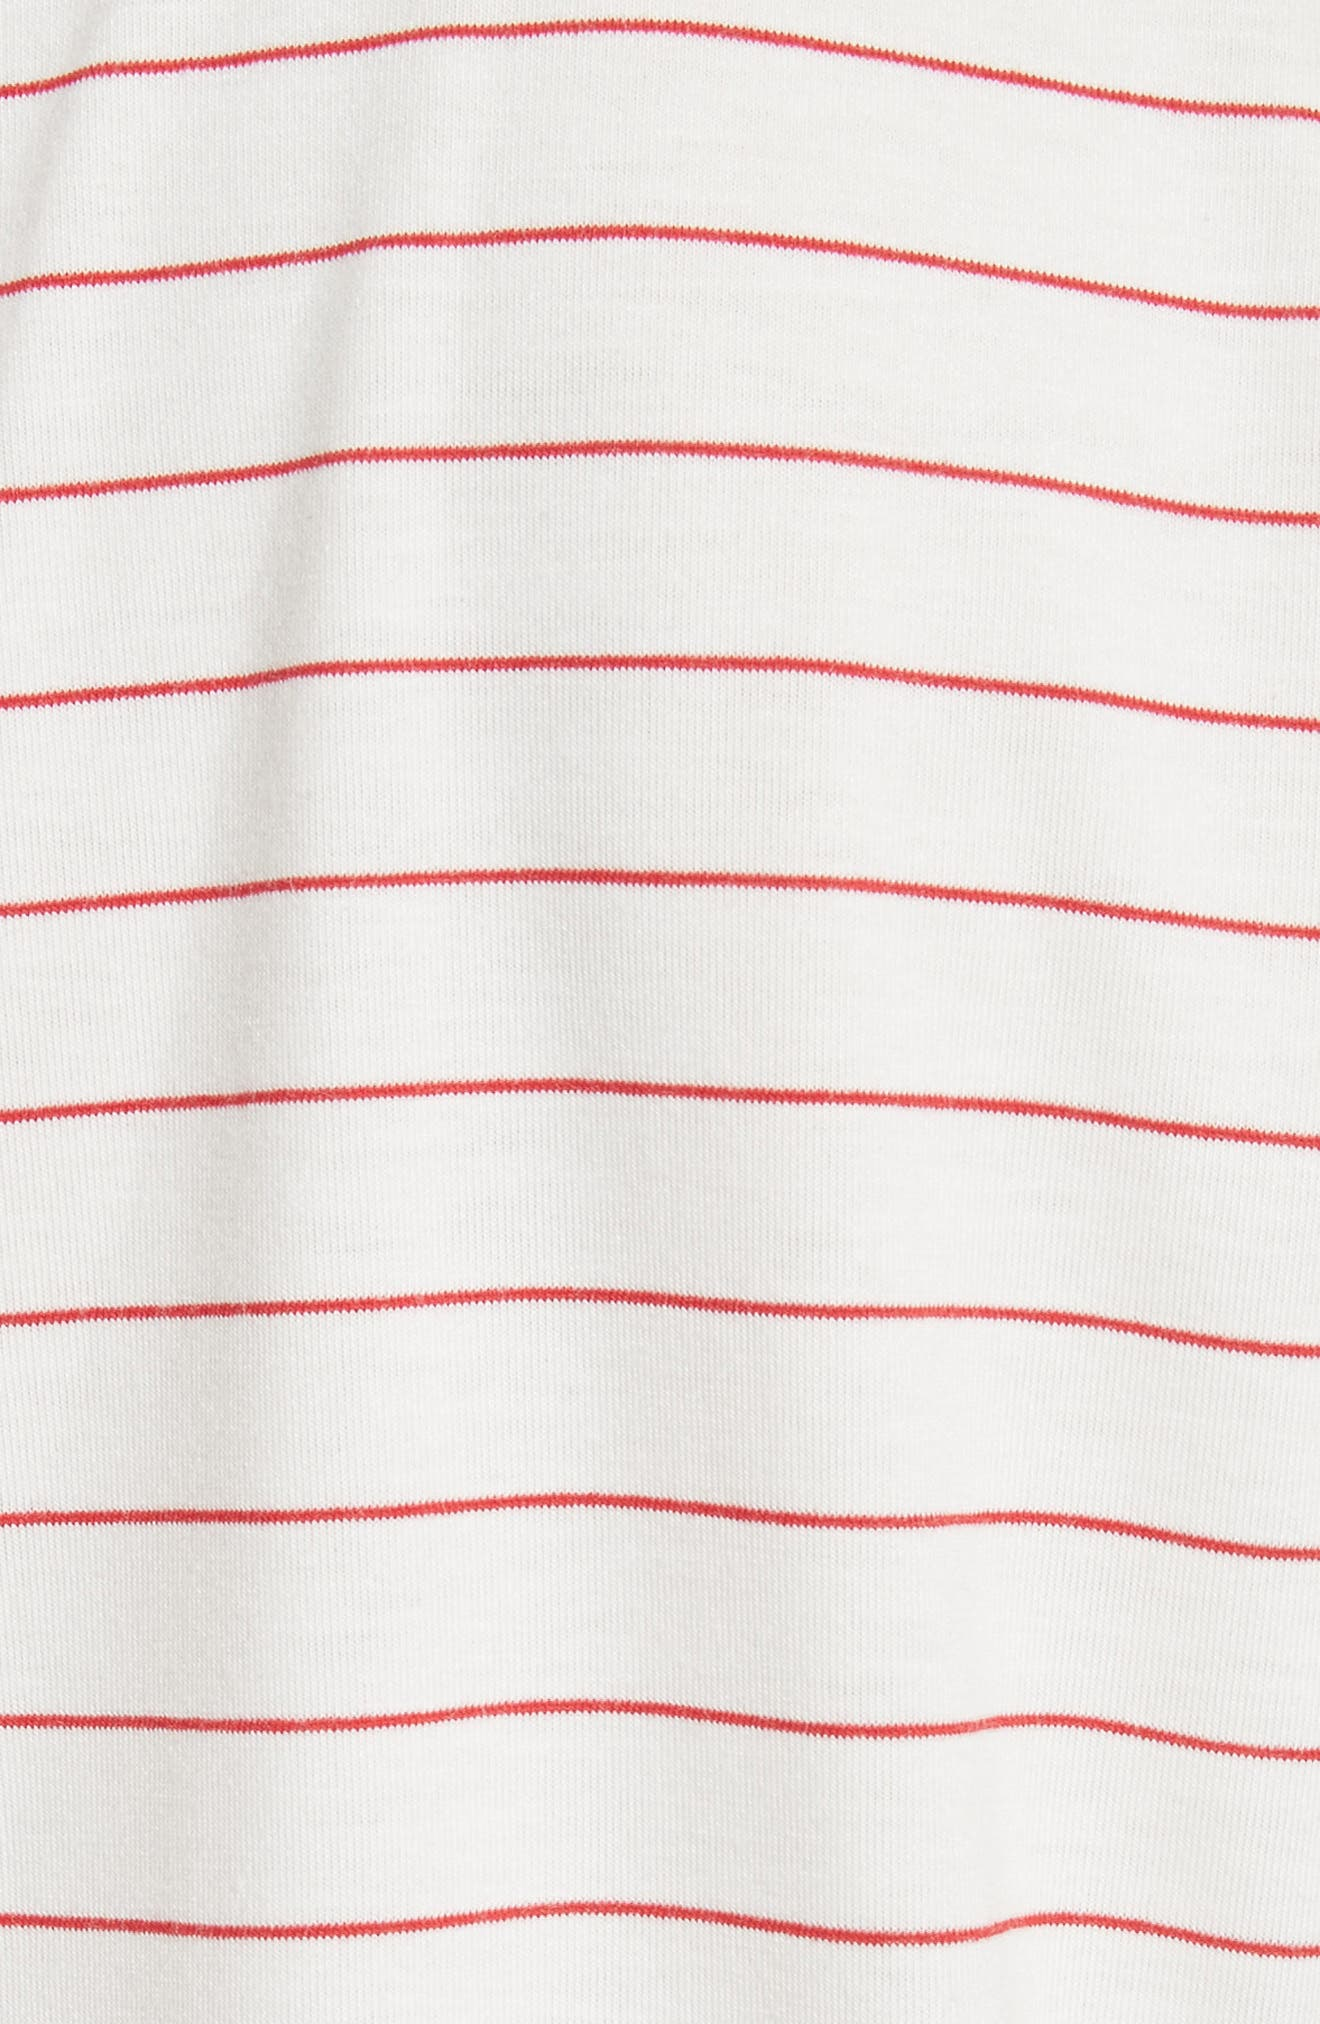 Stripe Crewneck T-Shirt,                             Alternate thumbnail 5, color,                             White/ Red